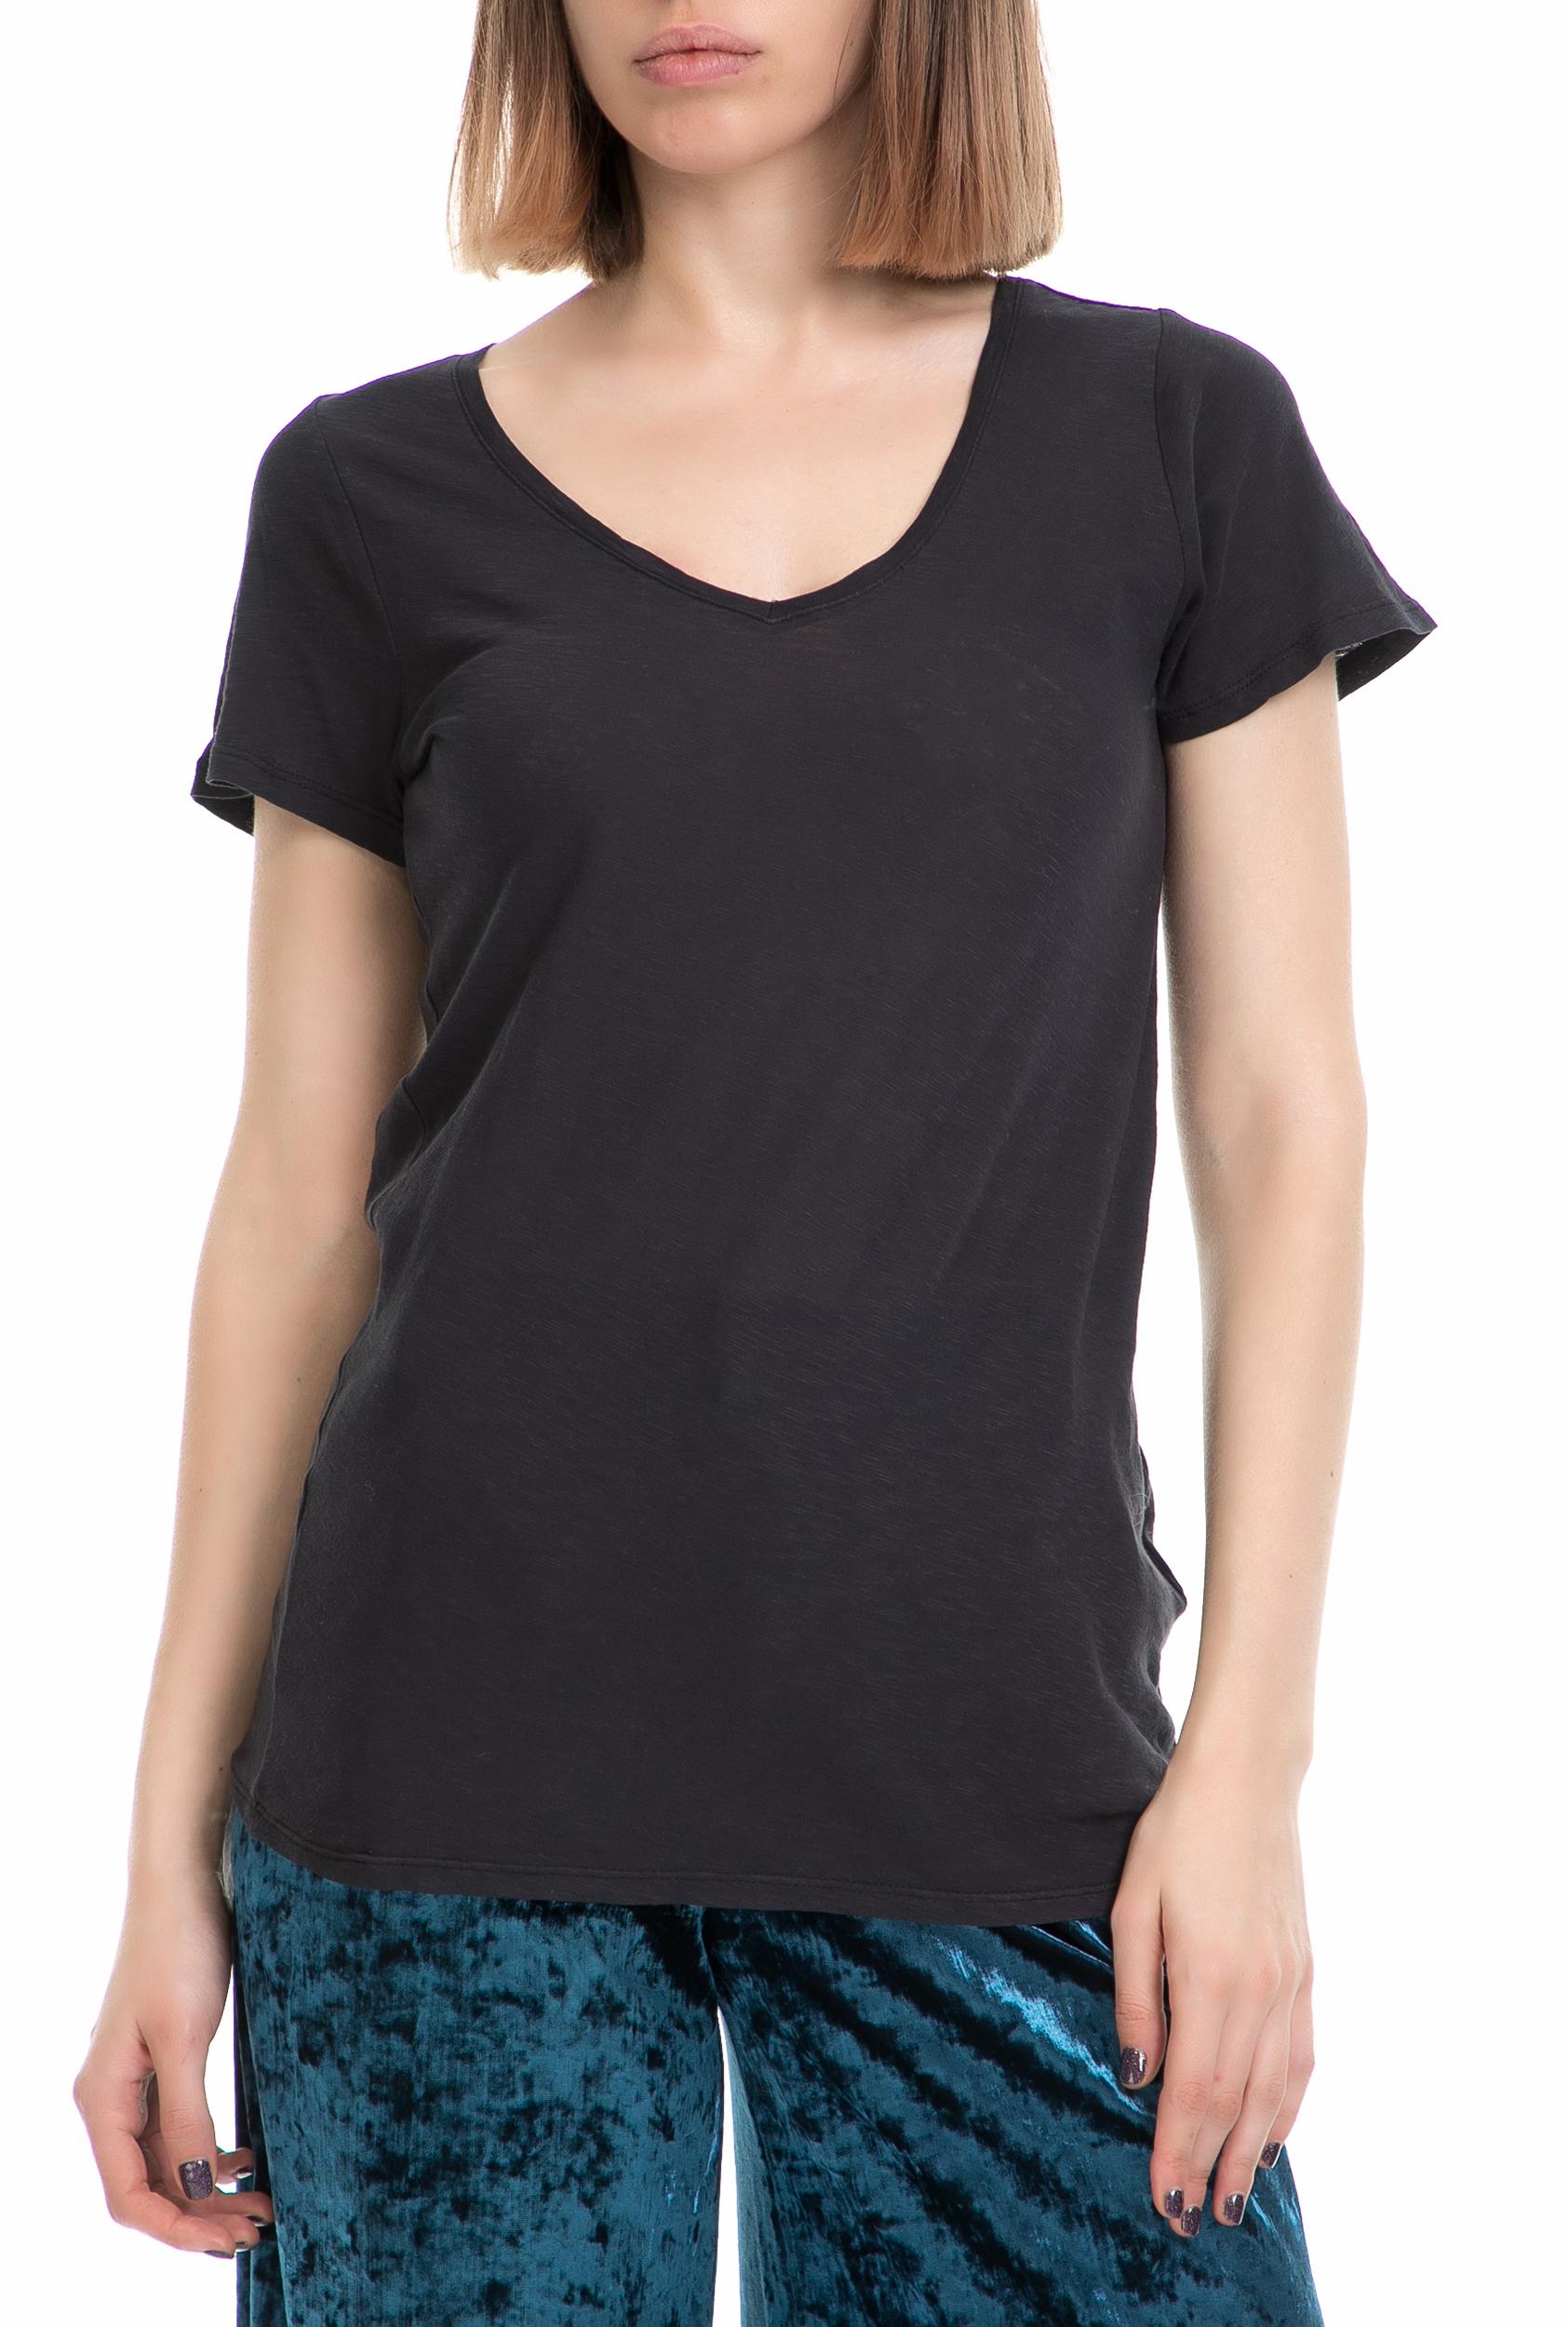 GARCIA JEANS - Γυναικείο T-shirt Donna GARCIA JEANS μαύρο